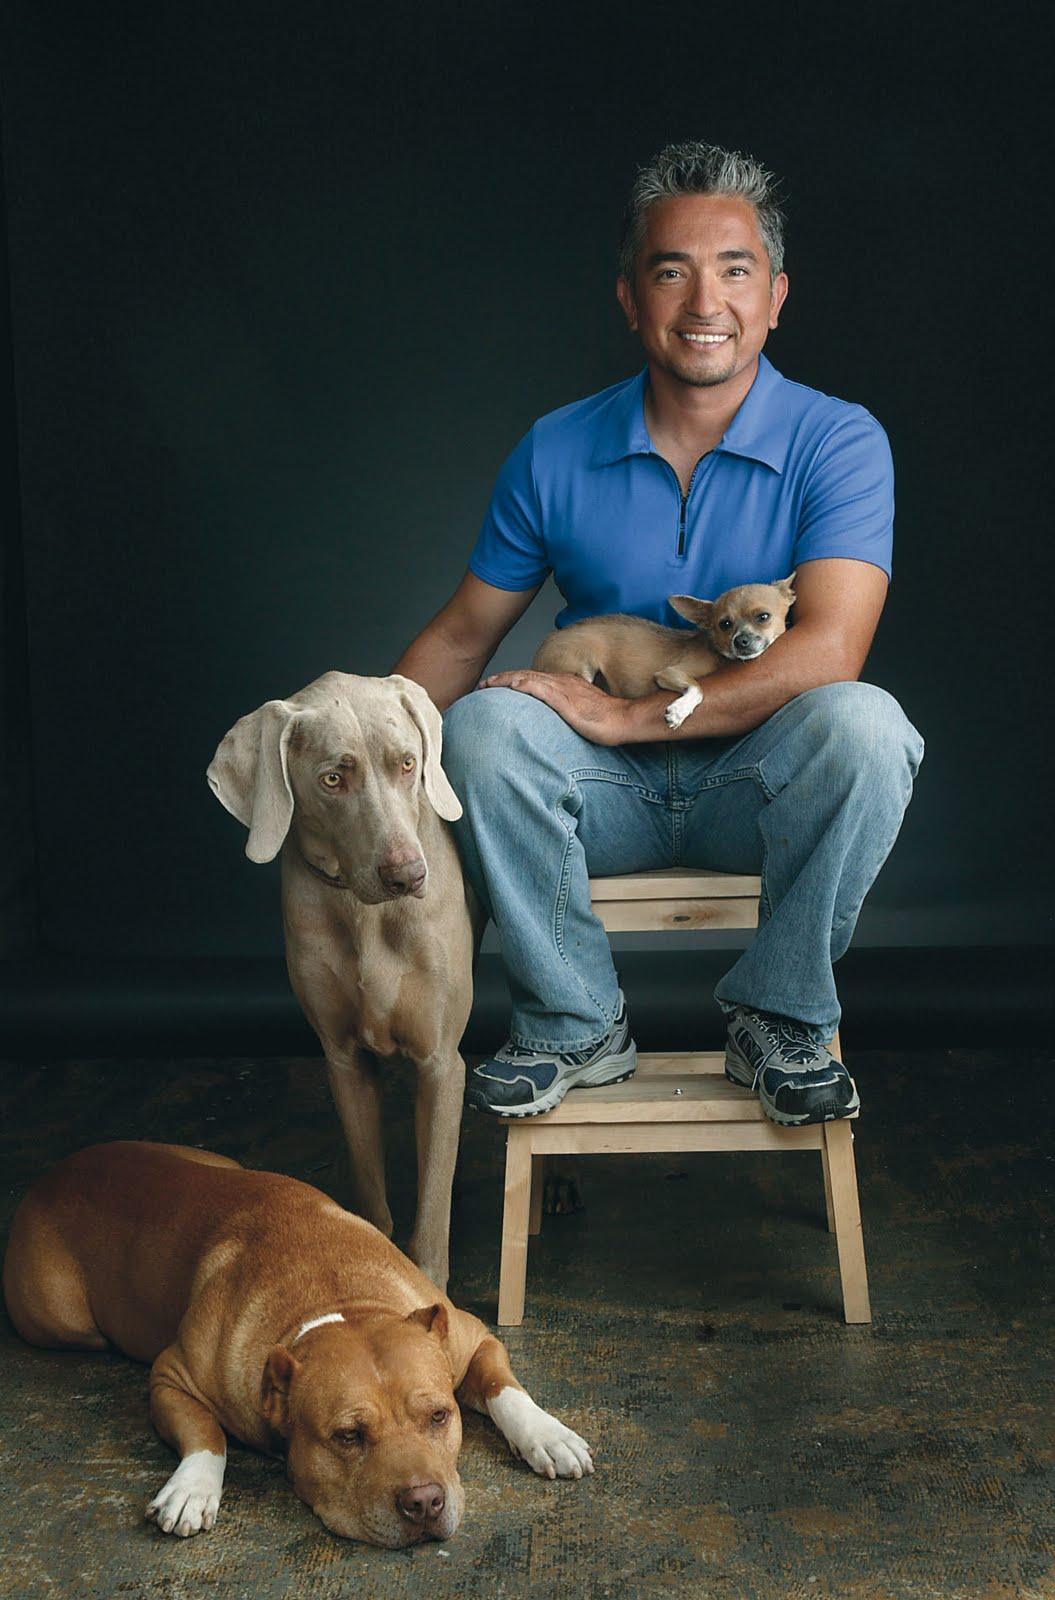 caring dog cesar millan quotes quotesgram. Black Bedroom Furniture Sets. Home Design Ideas